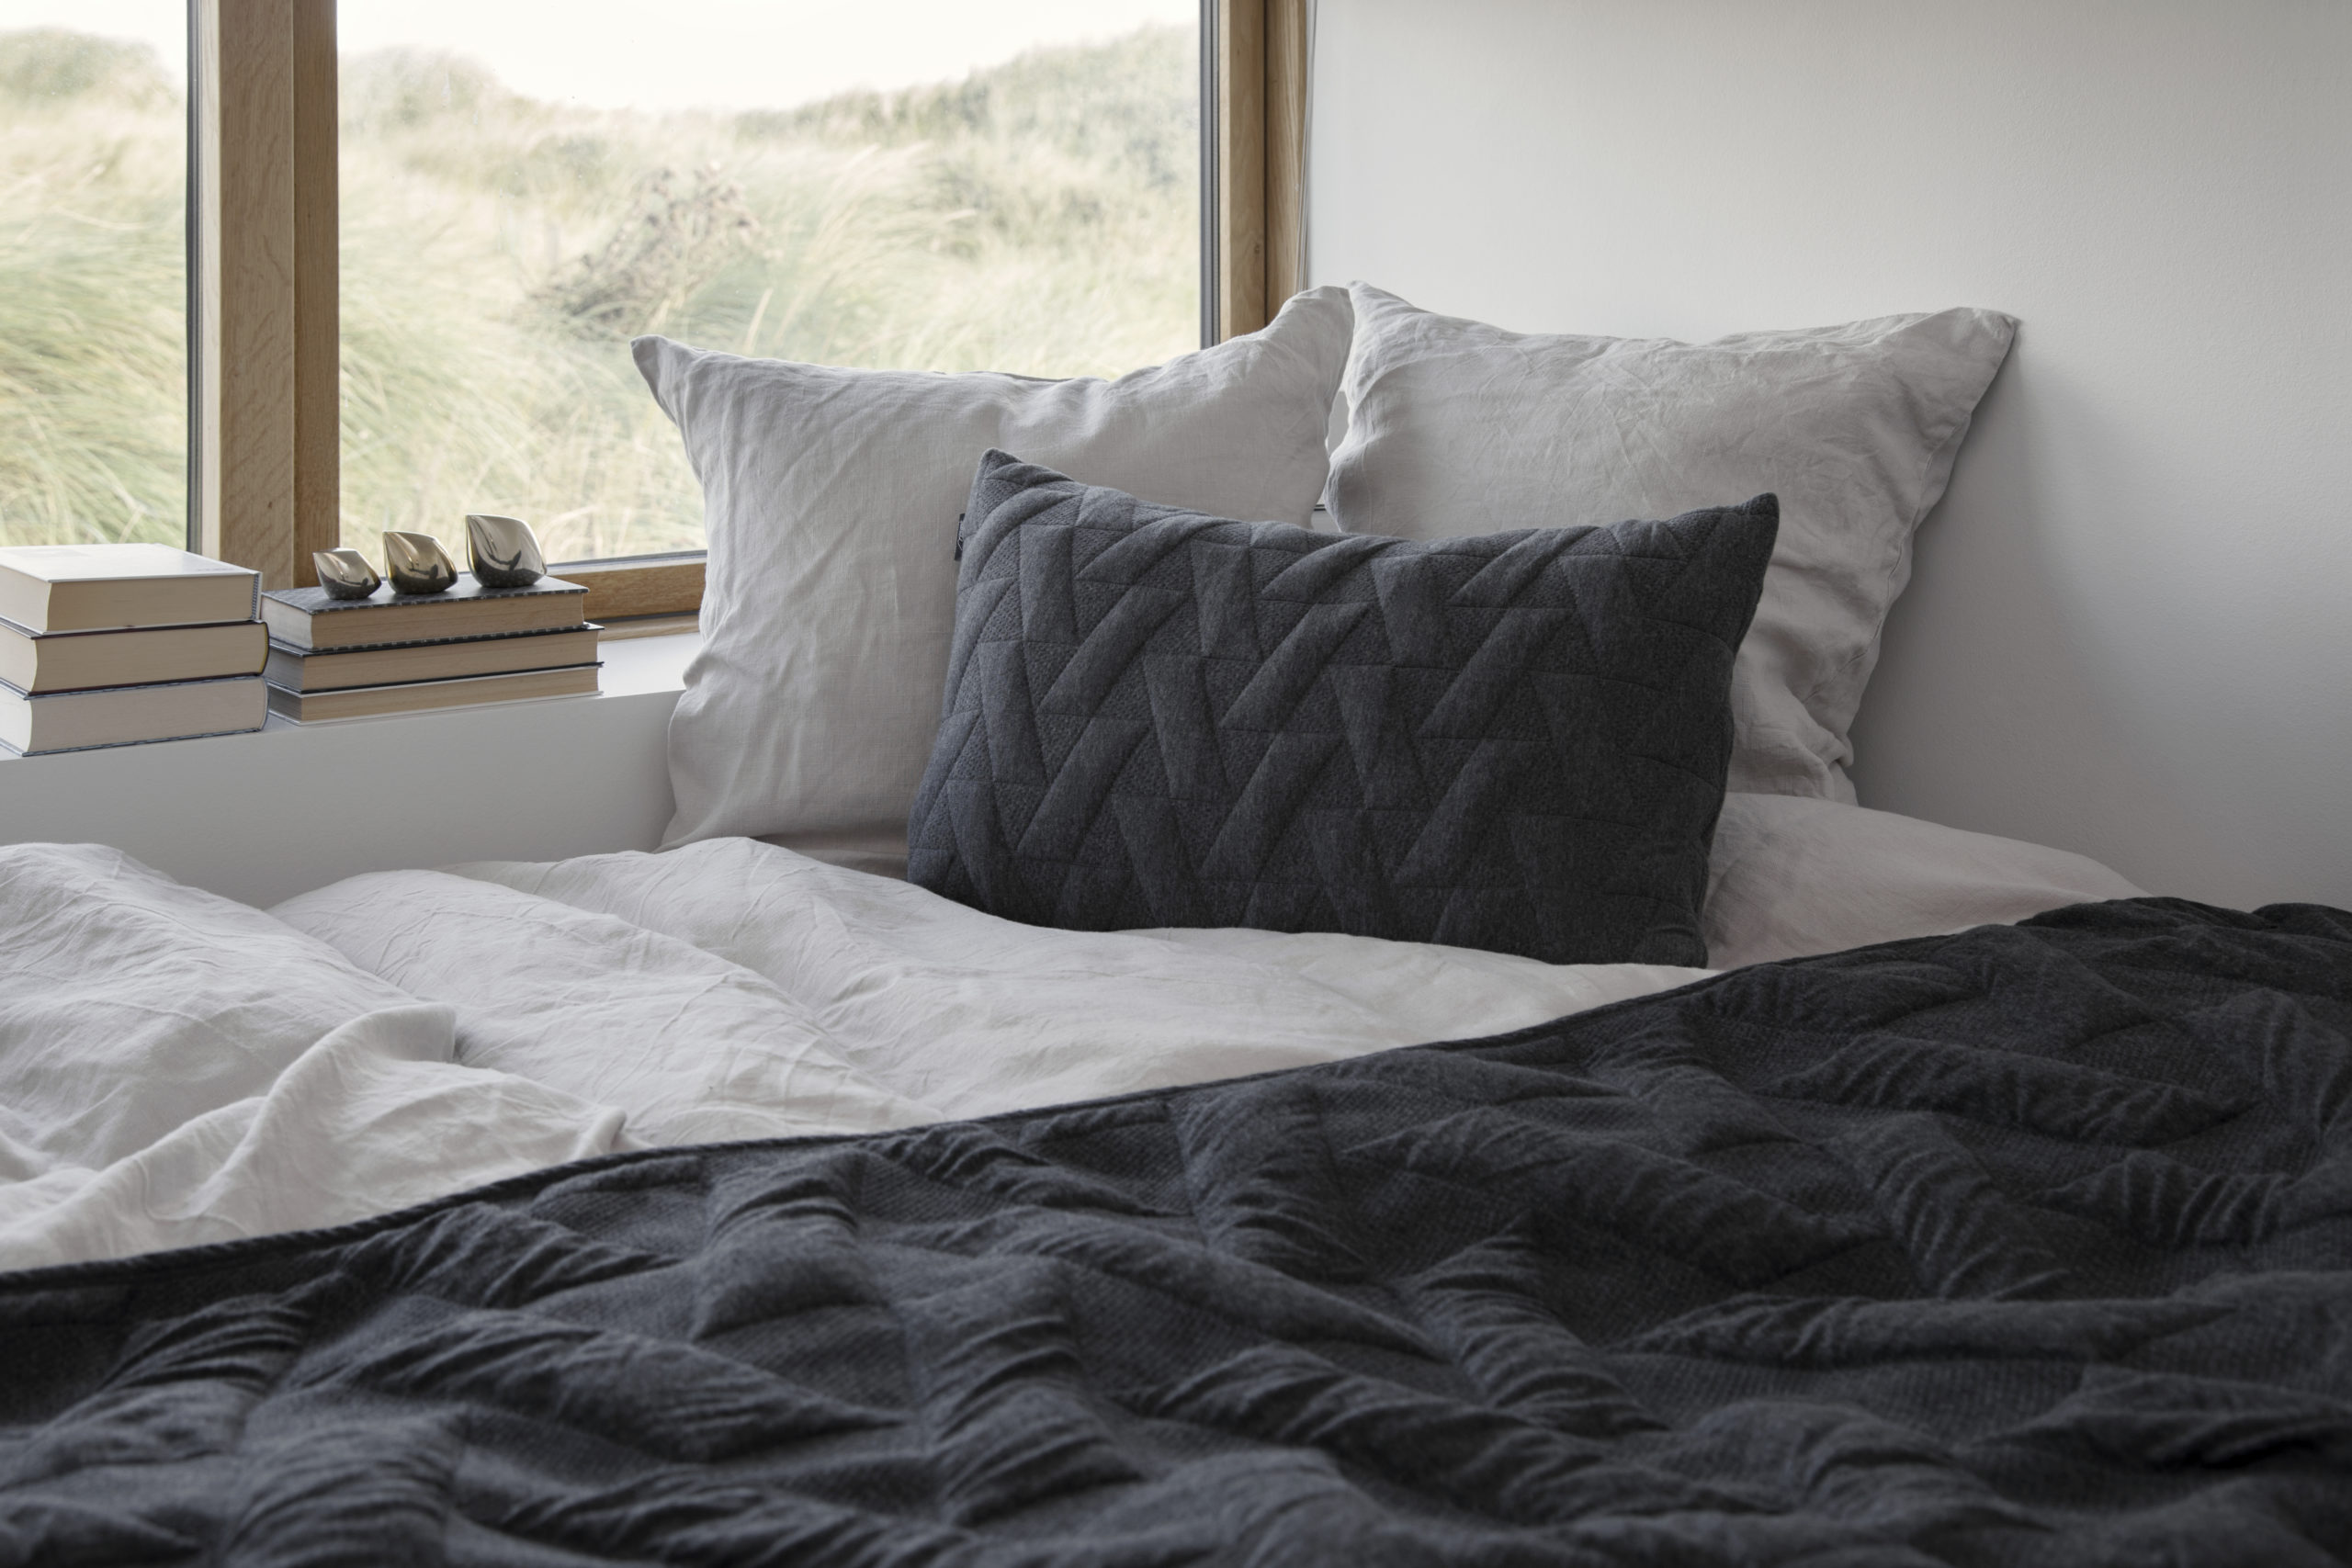 Architectmade-FJ-Pattern-Organic-Cotton-Pillows-Blankets-Denmark-Finn-Juhl-3